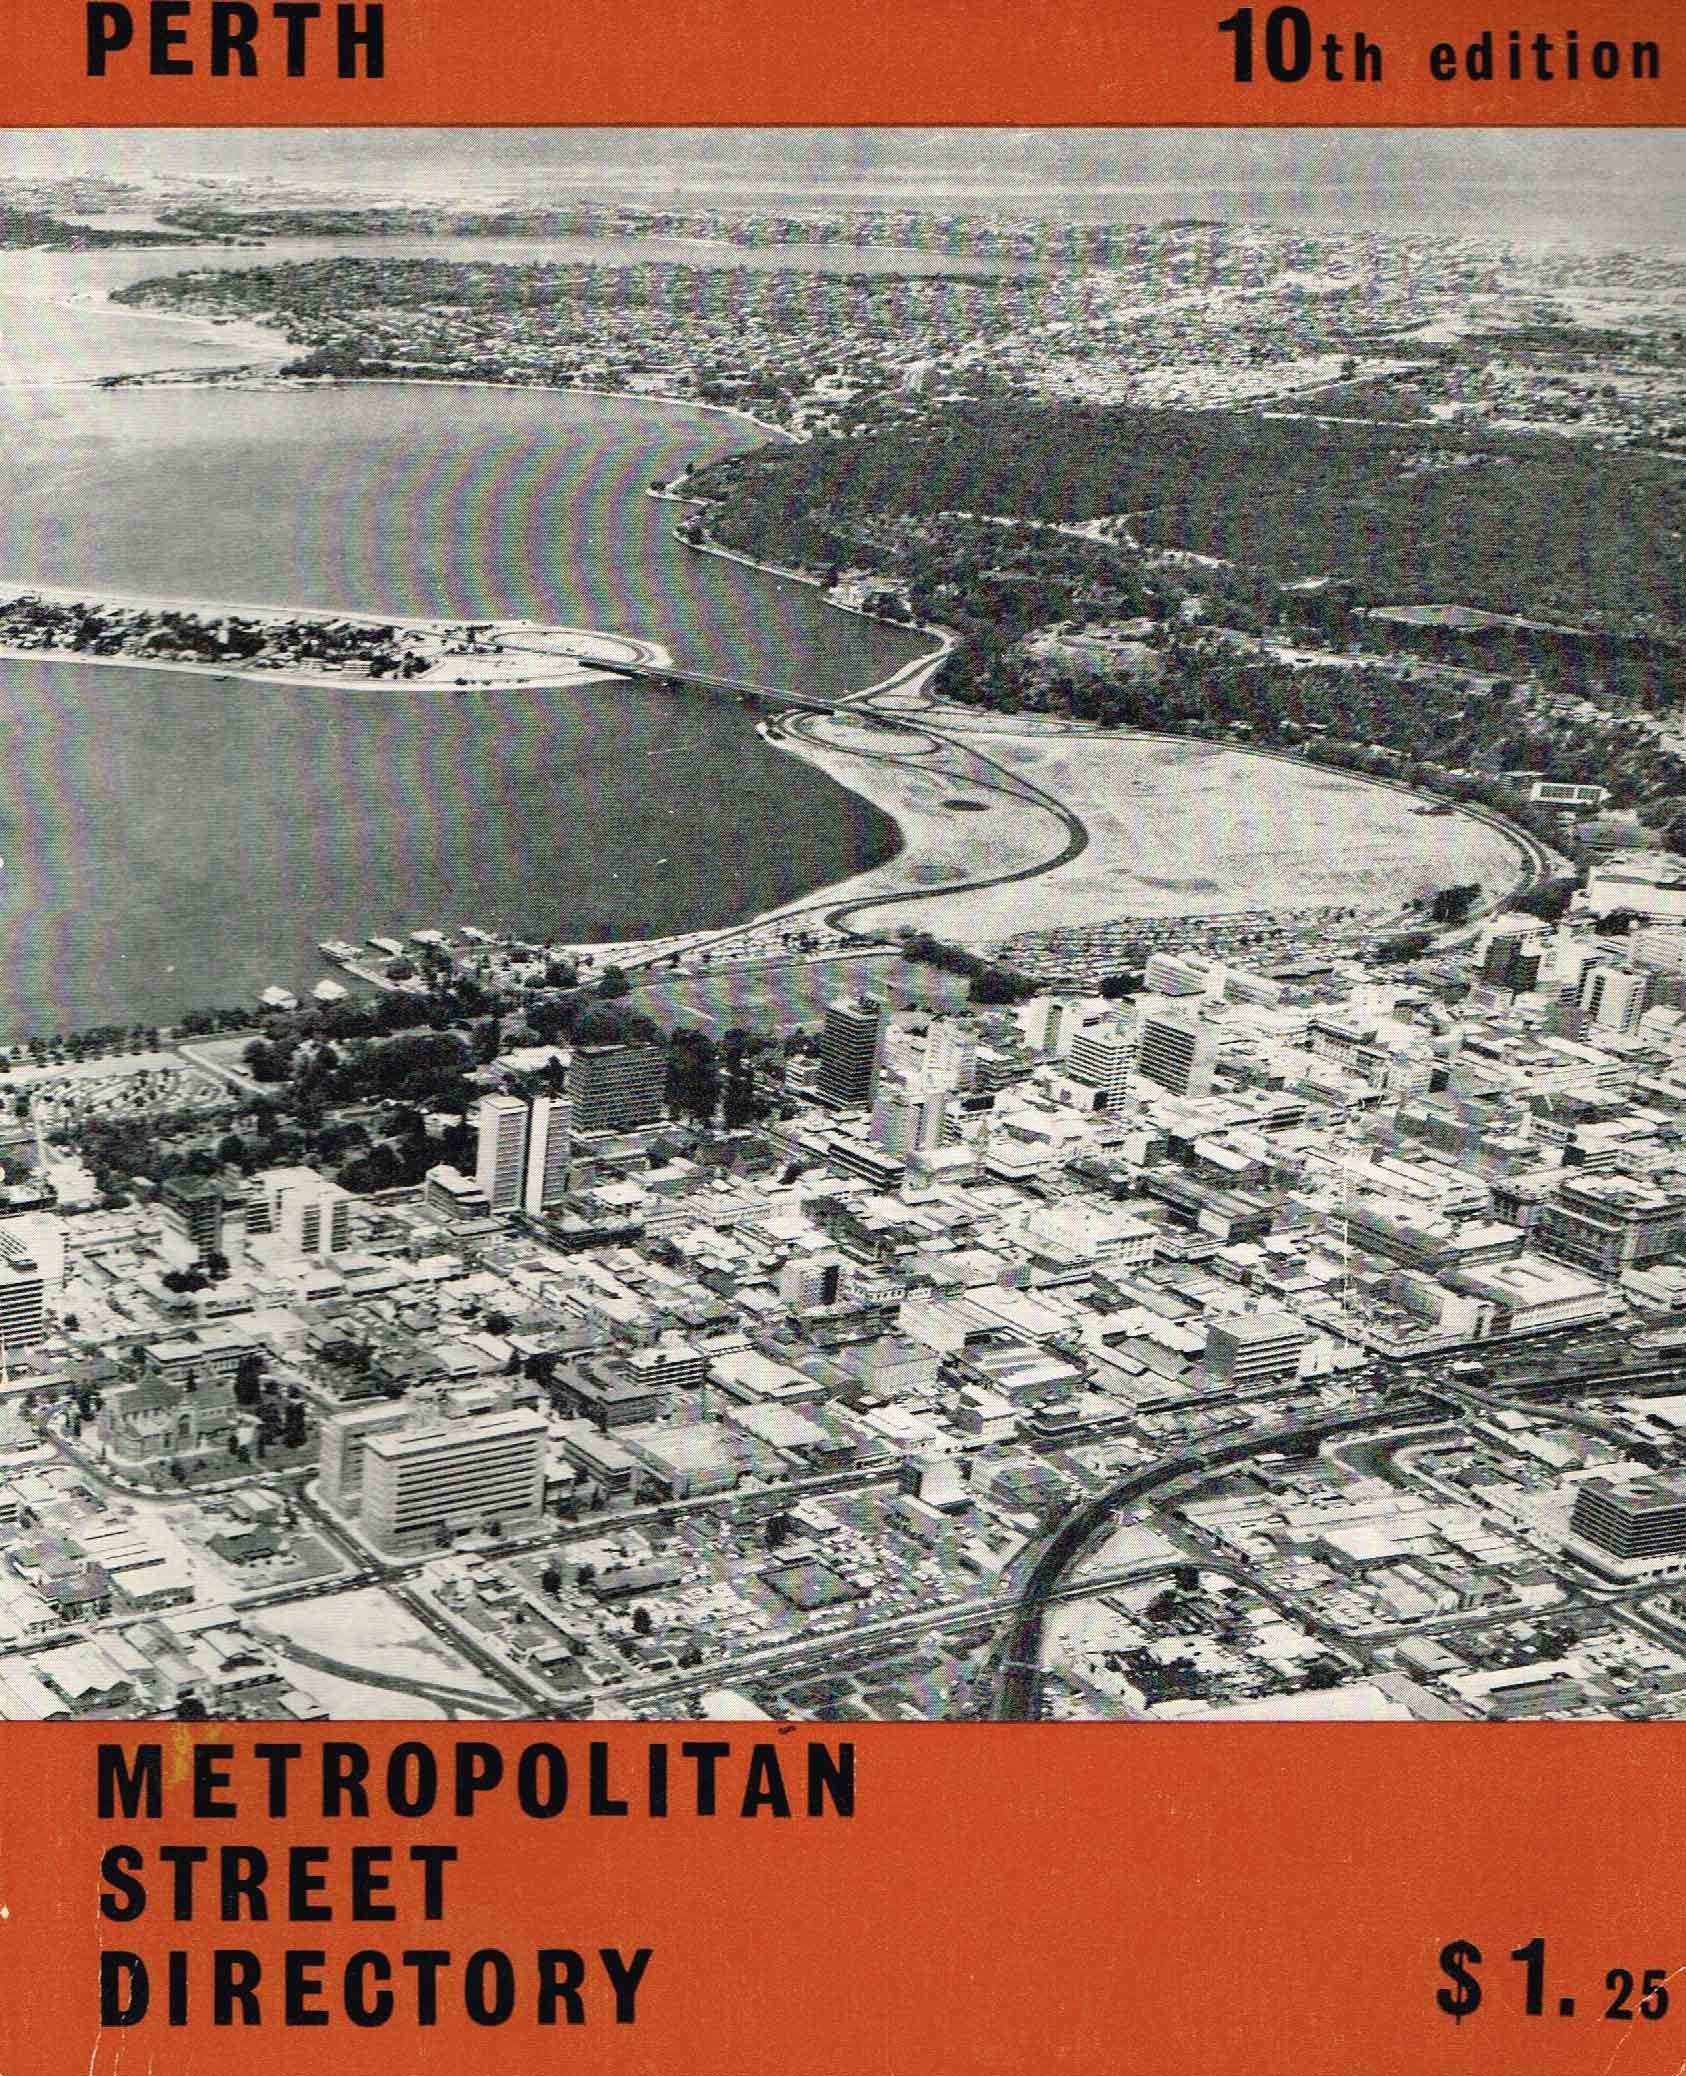 Perth-Metropolitan-Street-Directory-10th-Edition